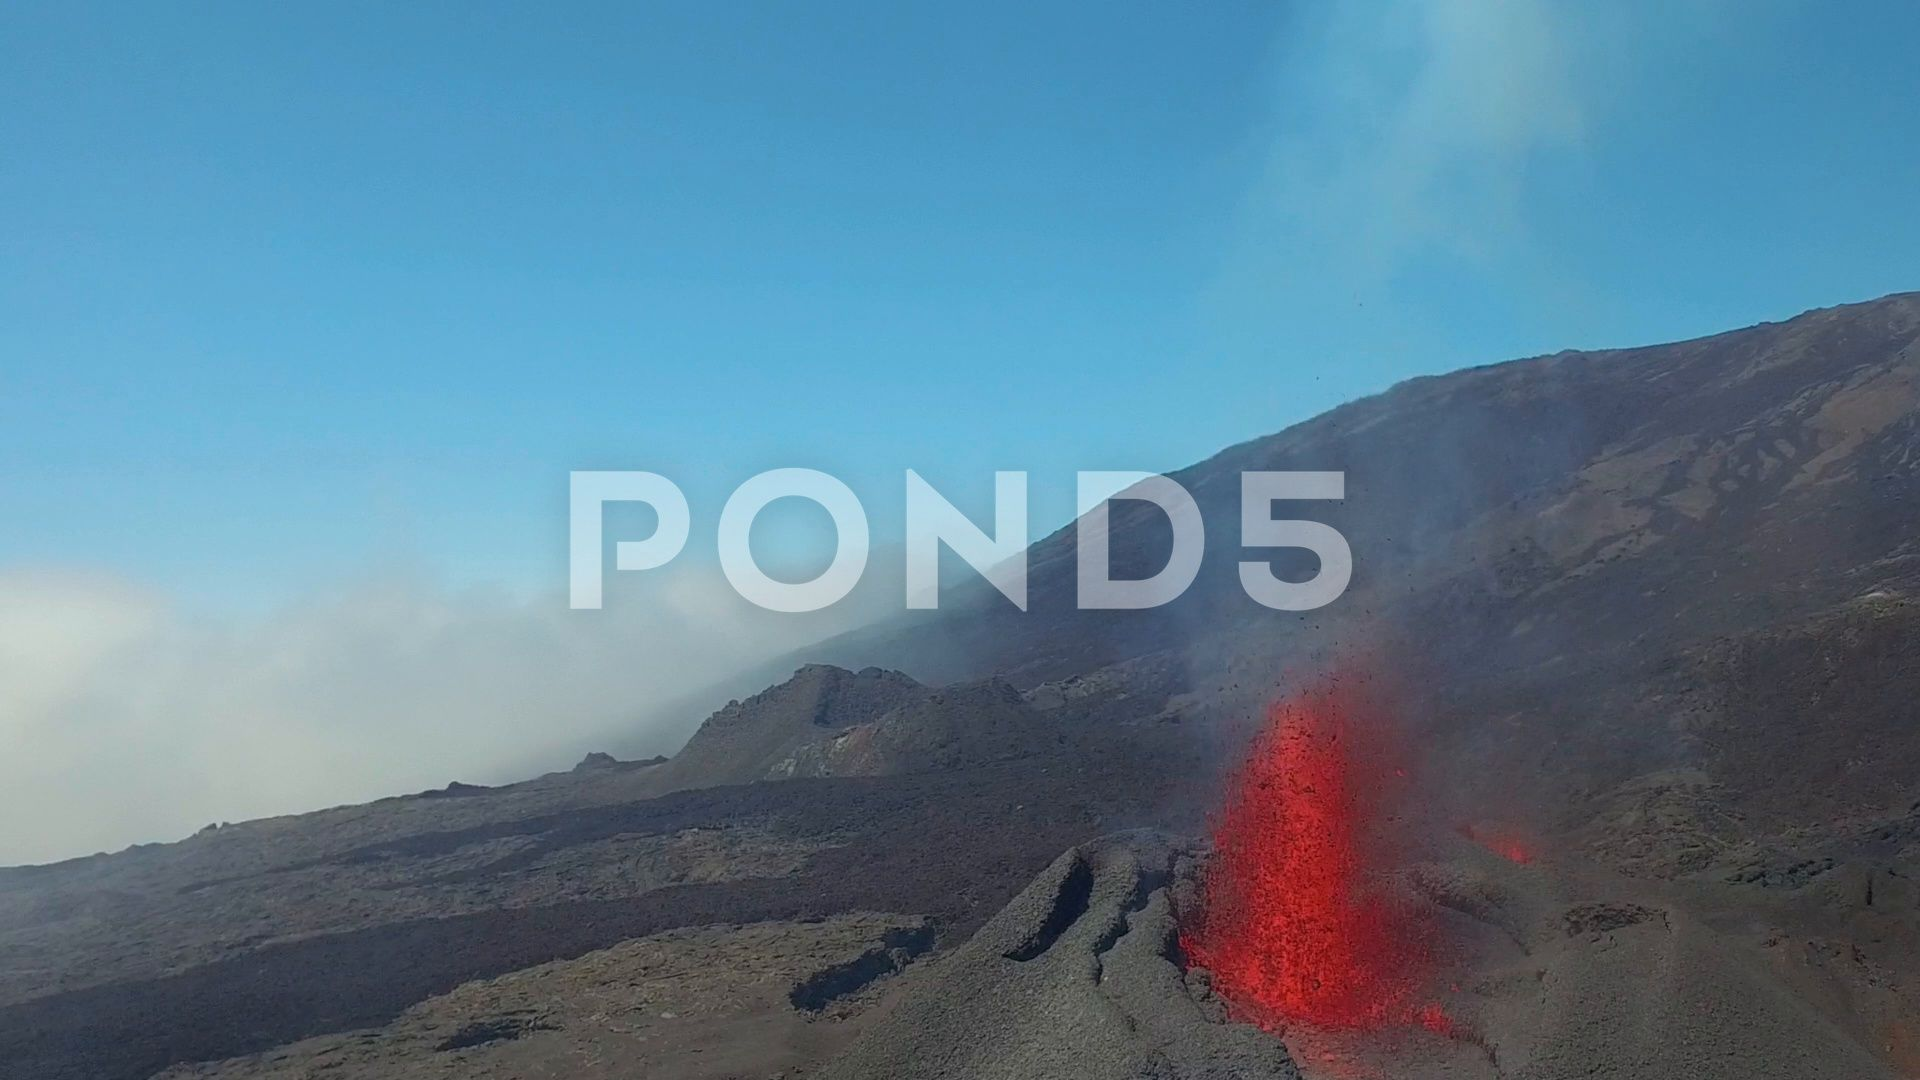 Eruption Of Piton De La Fournaise Seen By Drone Stock Footage De La Eruption Piton Stock Footage Stock Video Game Design